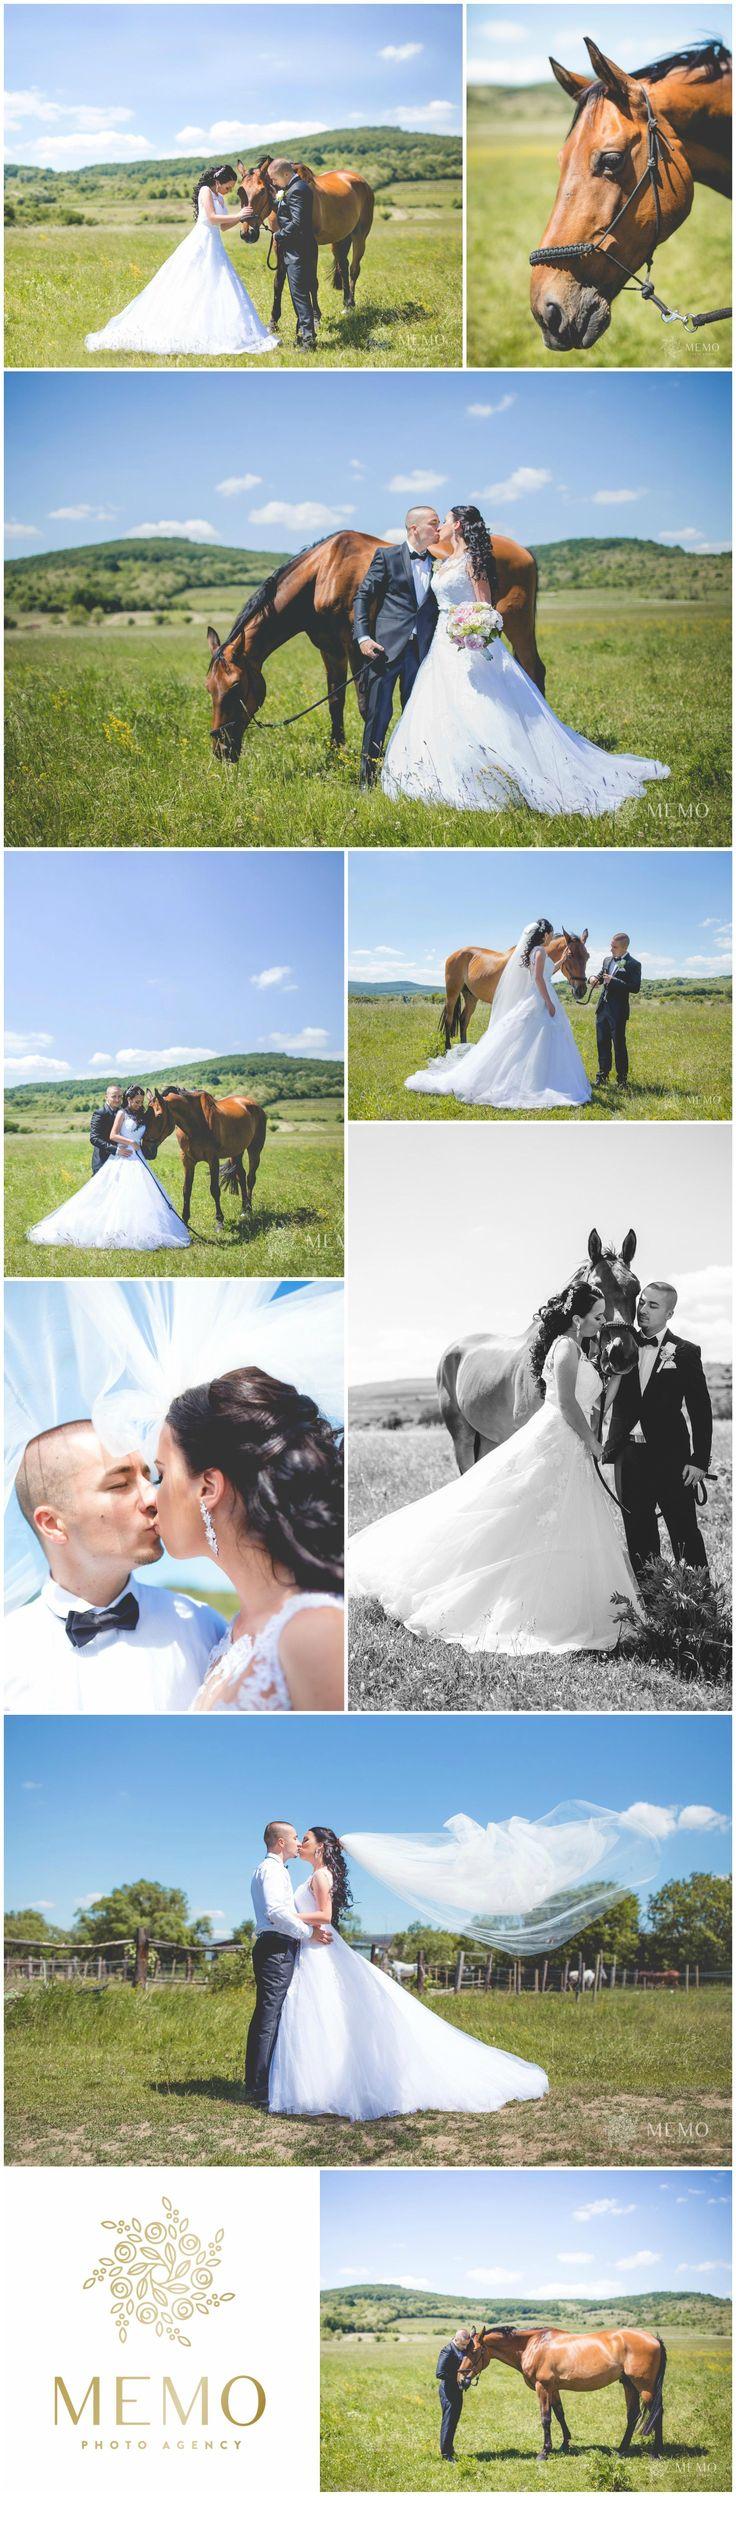 Wedding portraits with horse -  MEMO photo agency www.memo.sk  #wedding #portrait #photography #photo #horse #horses #inspiration #weddingrings #rings #bride #weddingdress #couple #love #sun #memo #memophotoagency